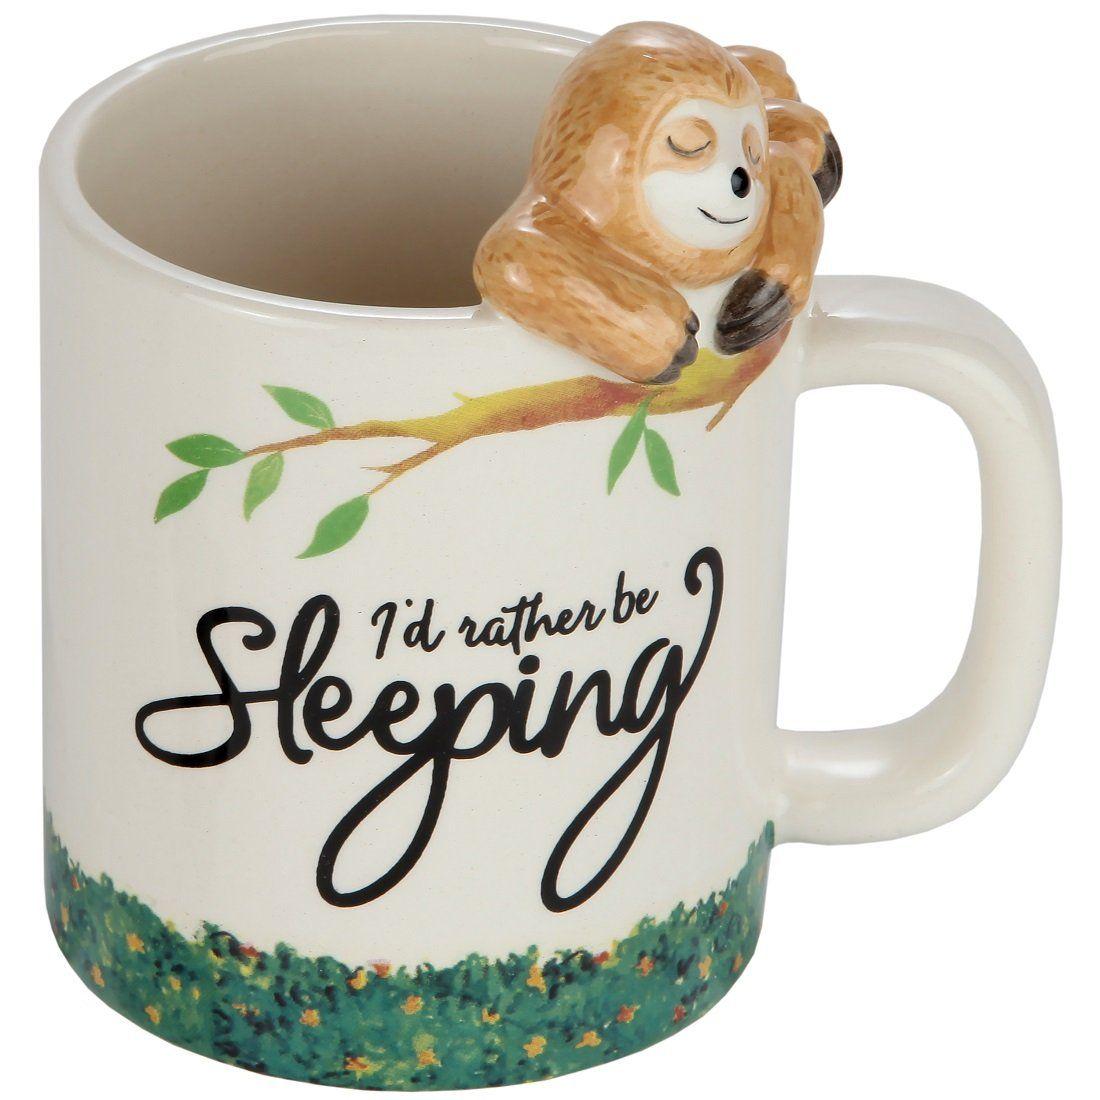 Cute Sloth Animal Sloffee Gift Idea White Fine Bone Ceramic 11 Oz Funny Coffee Mug Tea Cup Inspirational Quote for Men Women